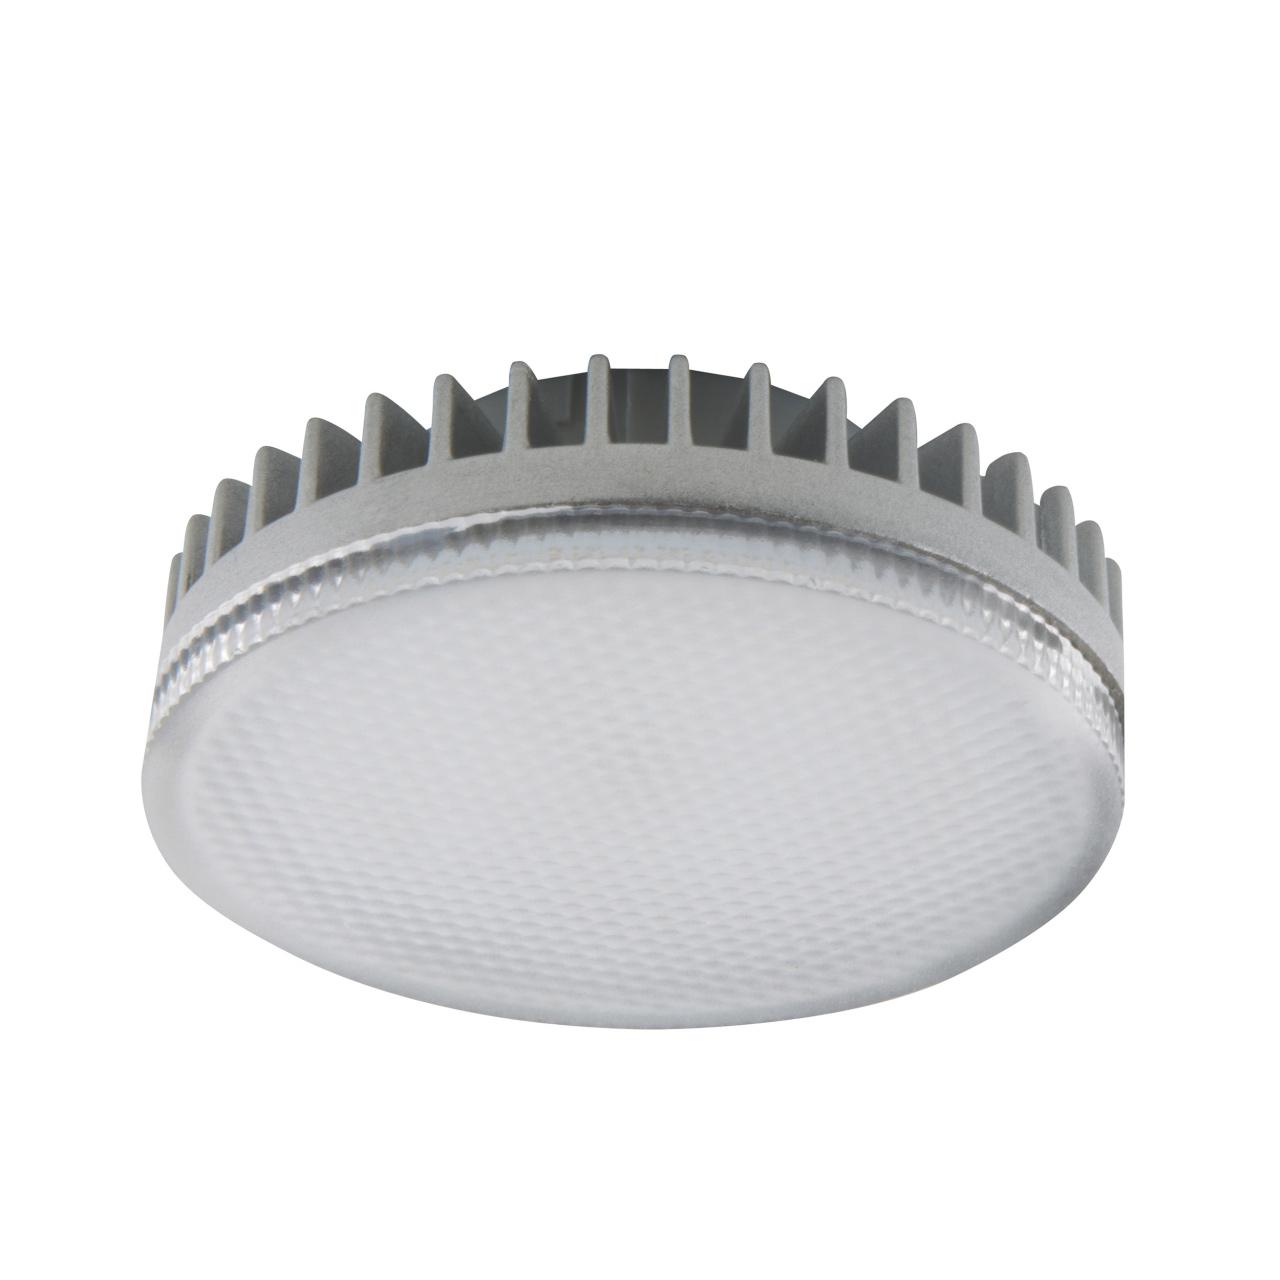 Лампа LED 220V TABL GX53 6W=60W 520LM 180G FR 2800K 20000H Lightstar 929062